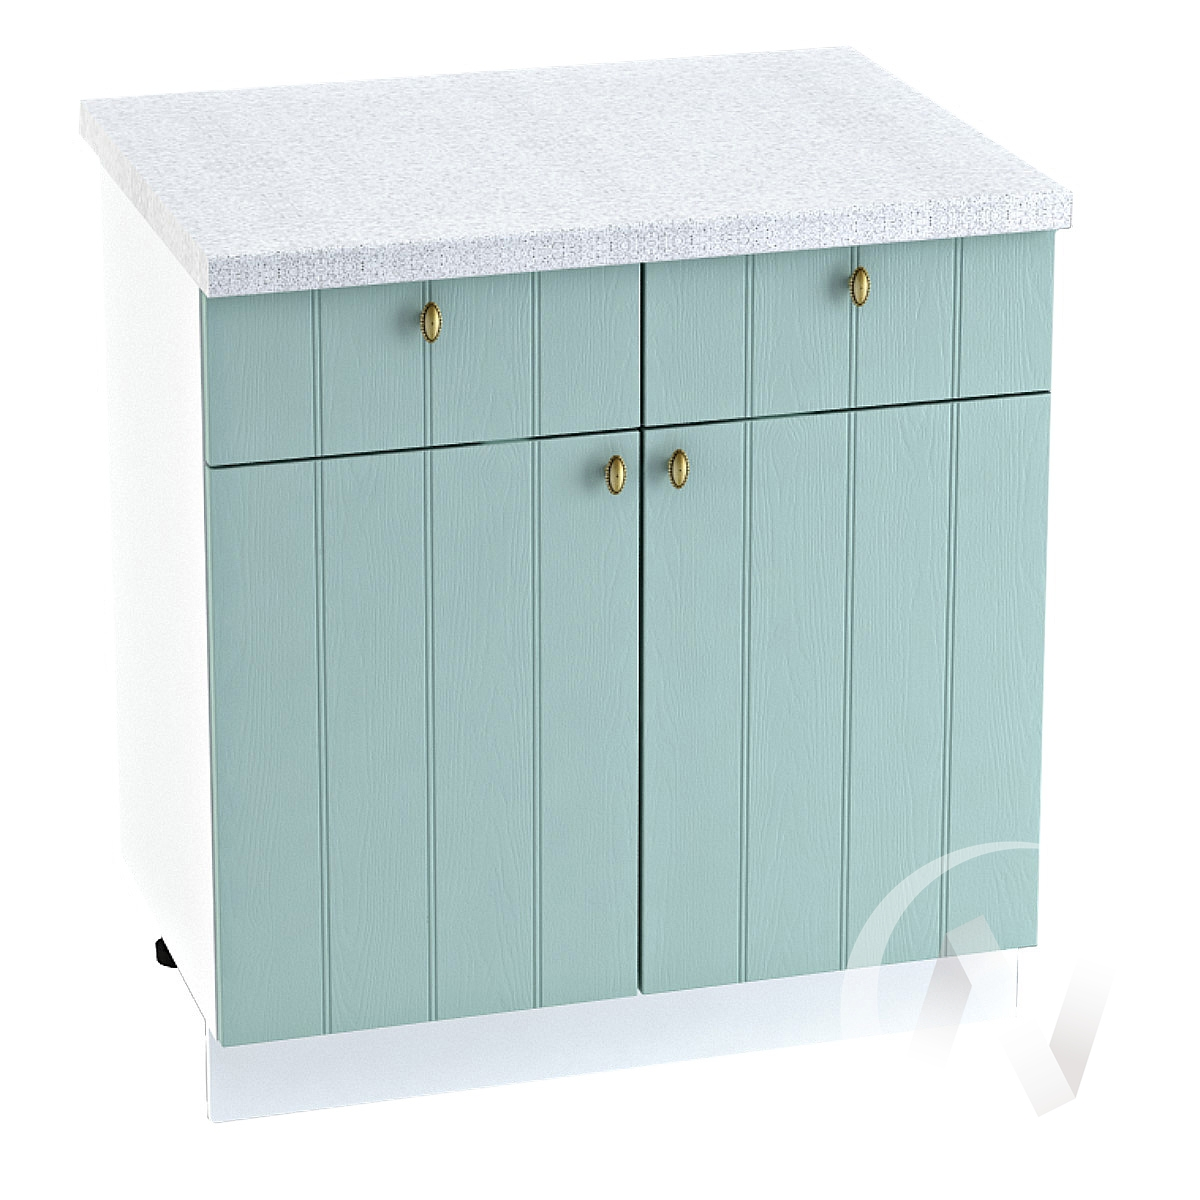 "Кухня ""Прованс"": Шкаф нижний с ящиками 800, ШН1Я 800 (голубой/корпус белый)"